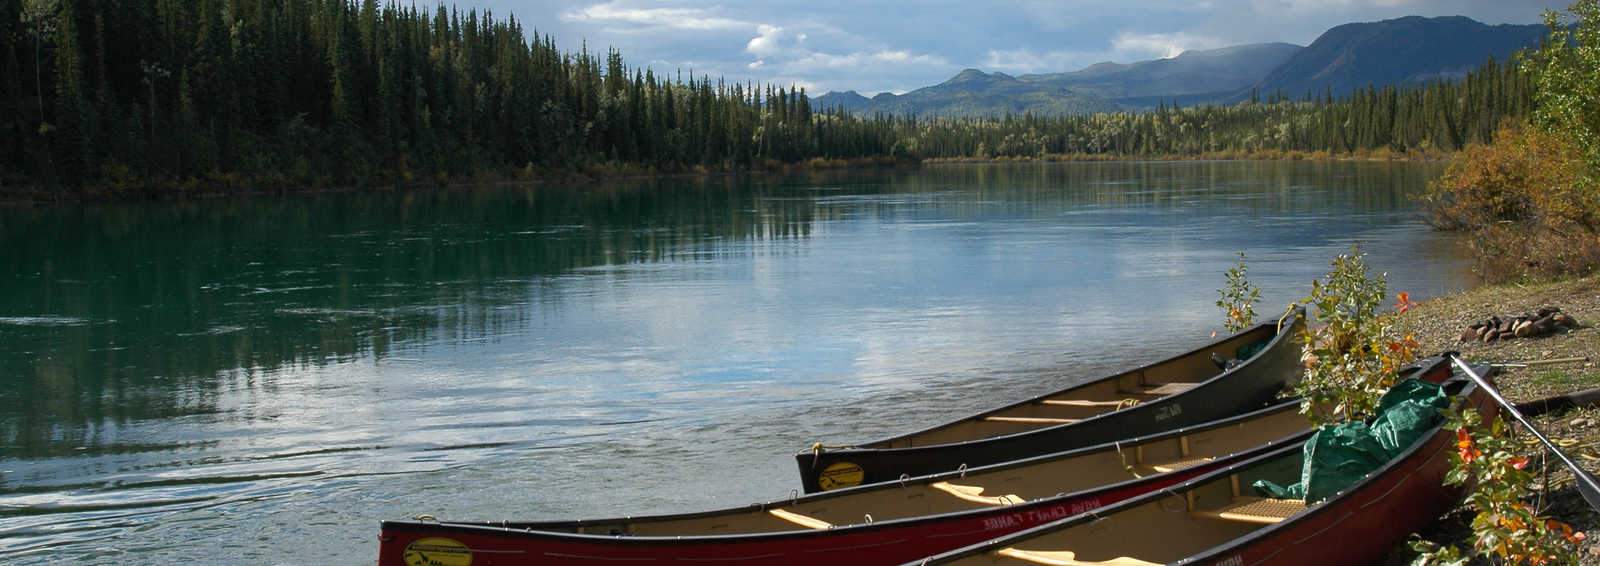 Kayaking down the Yukon River, Canada